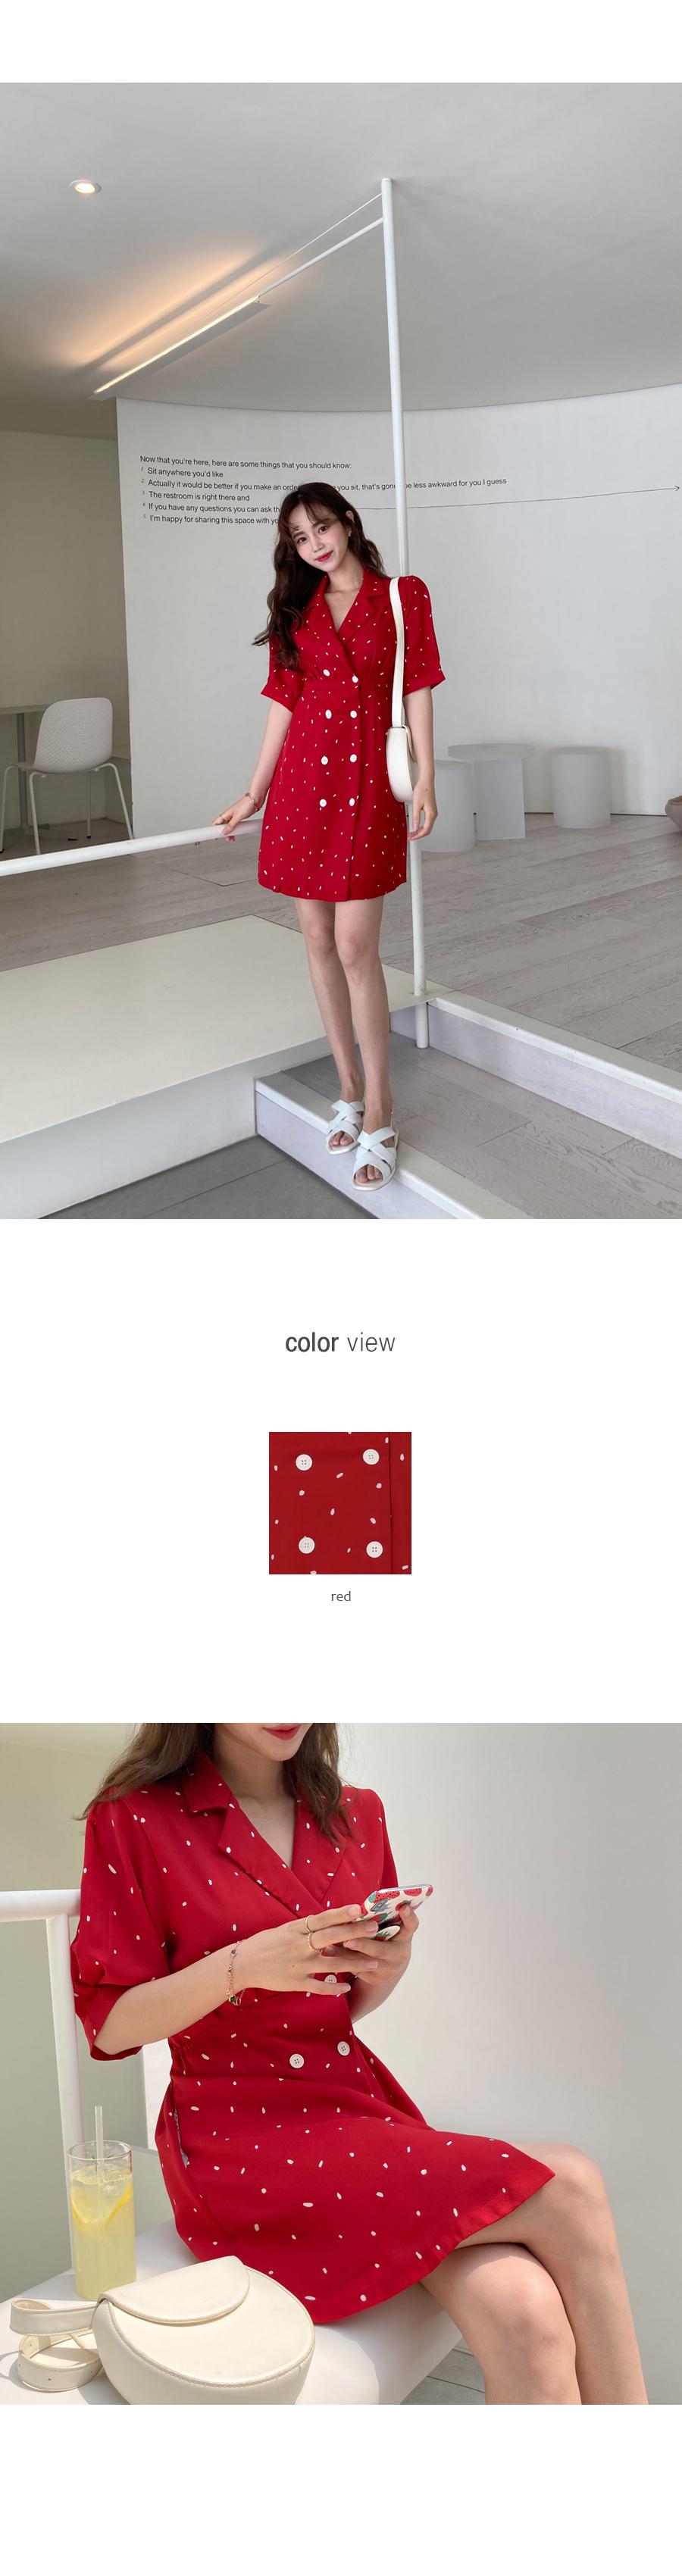 Dot love mini dress